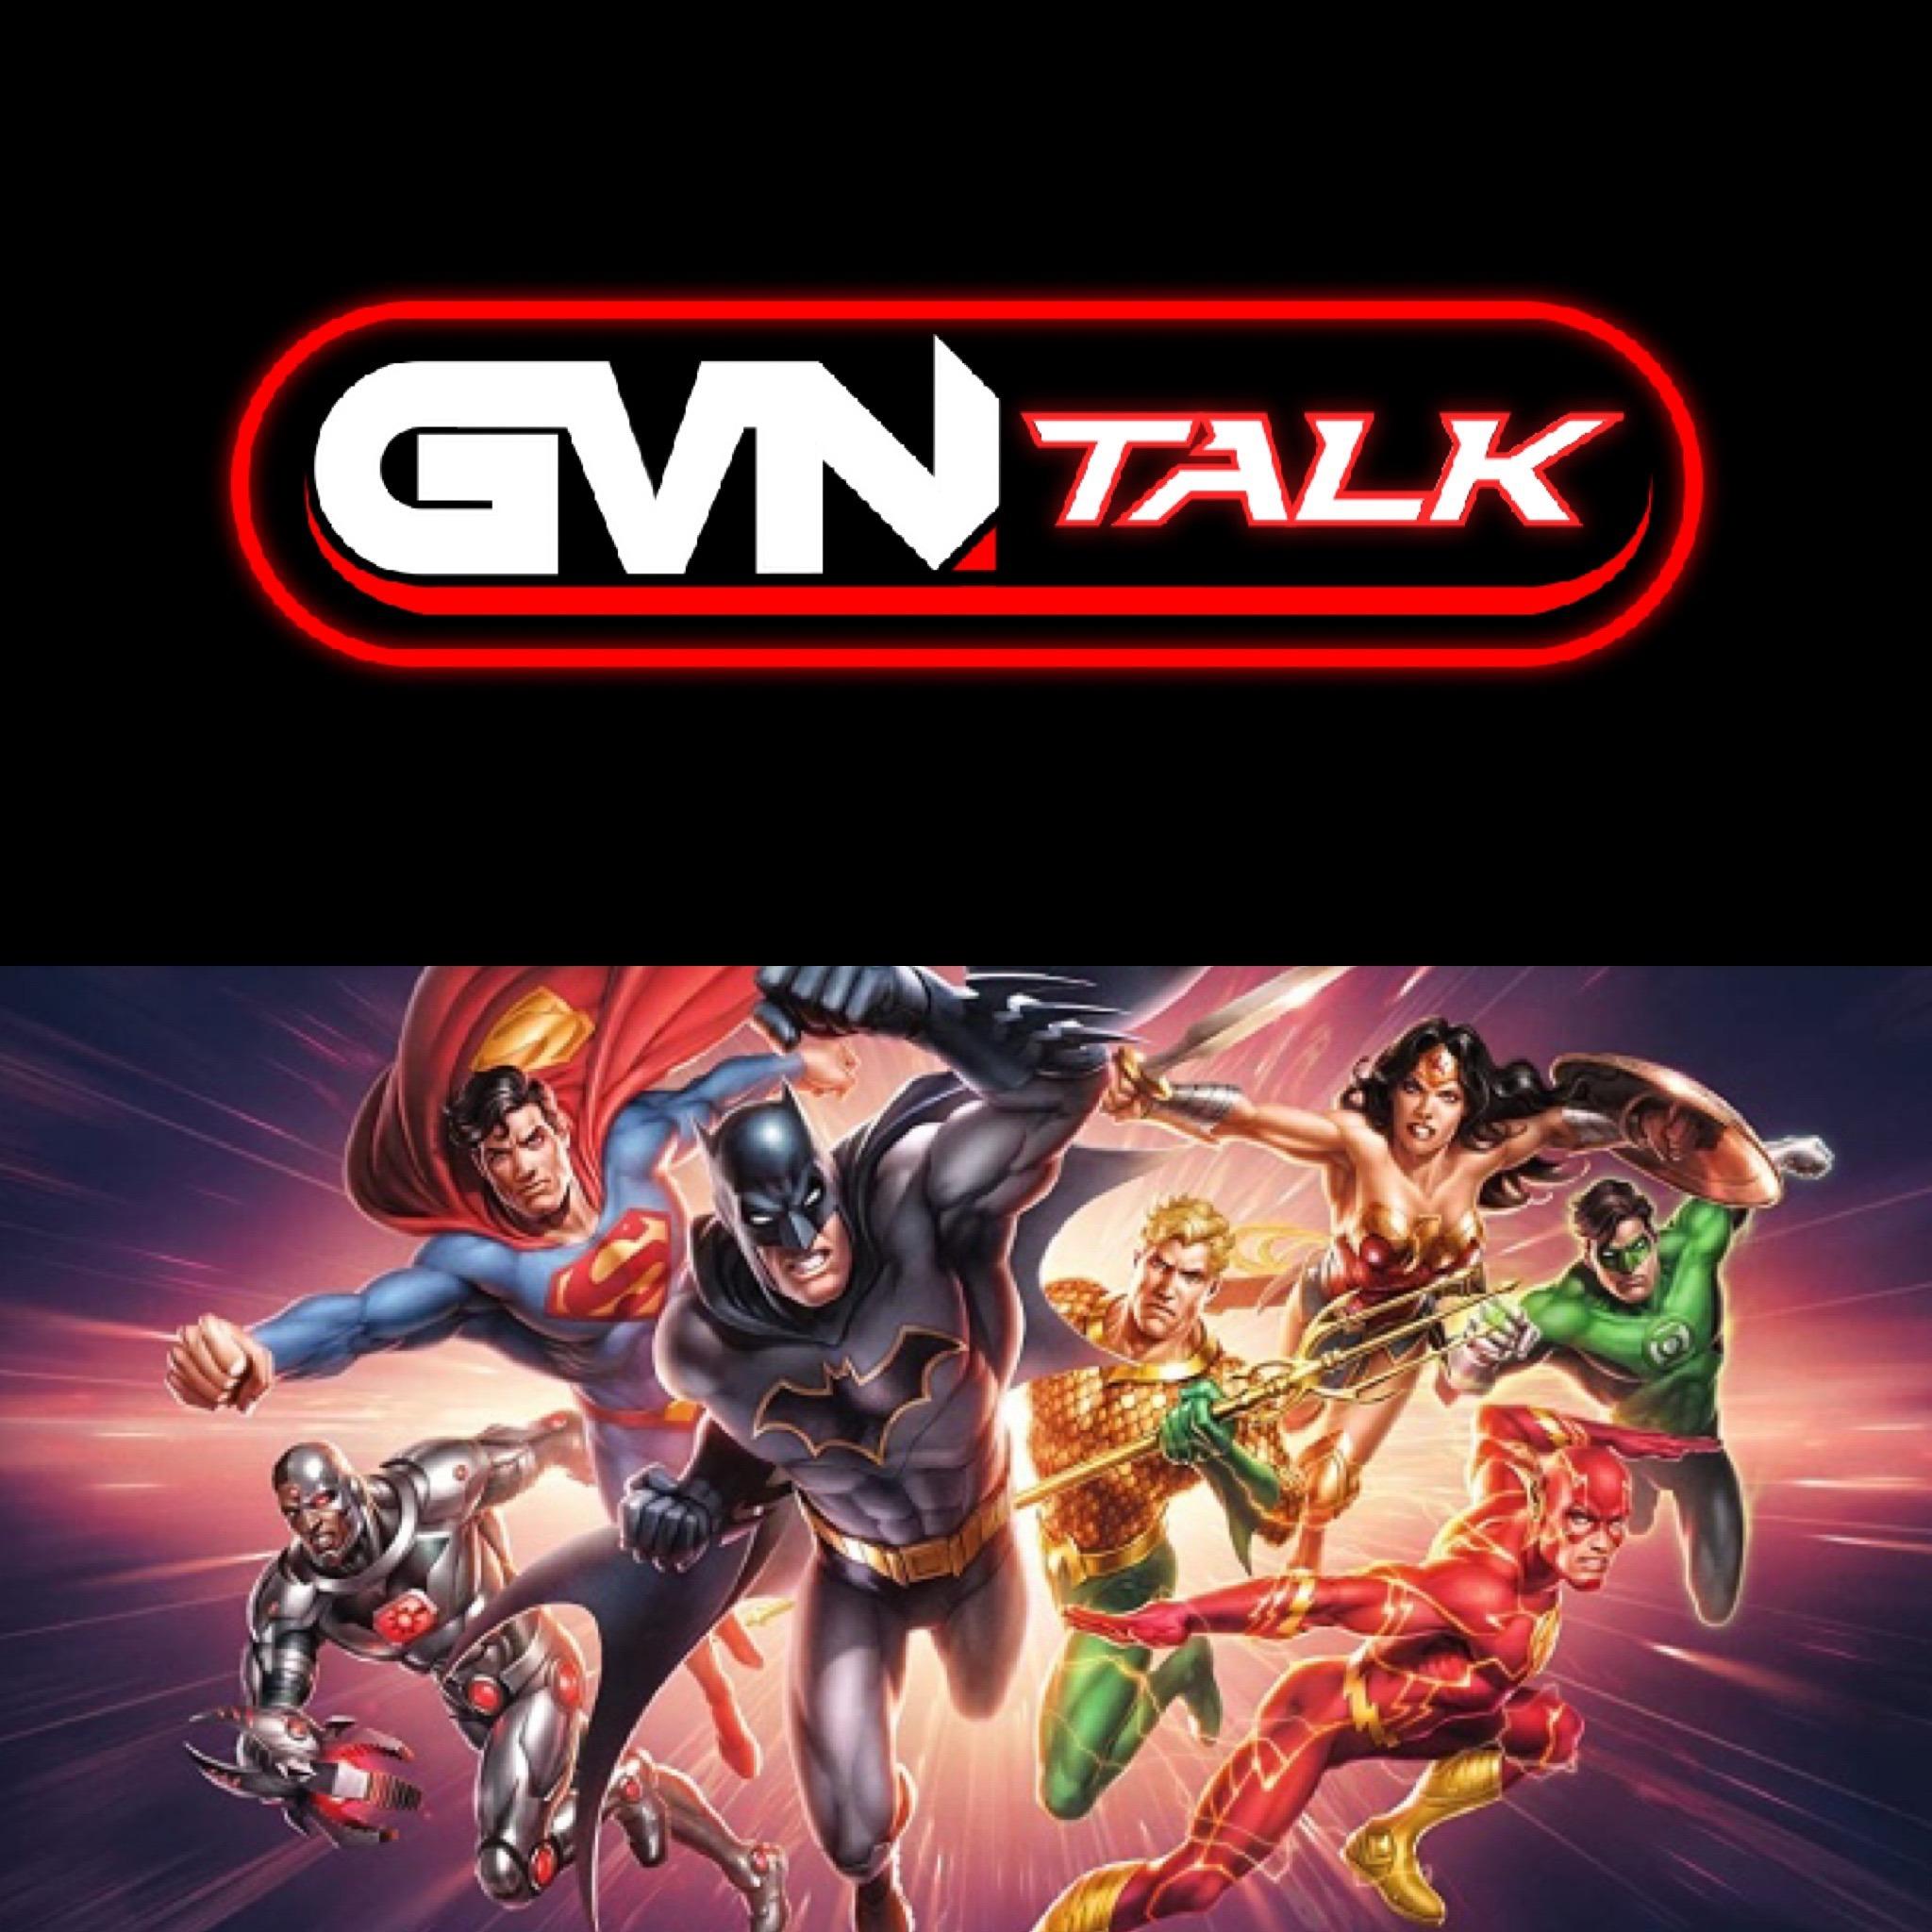 GVN Talk: The Best of DC